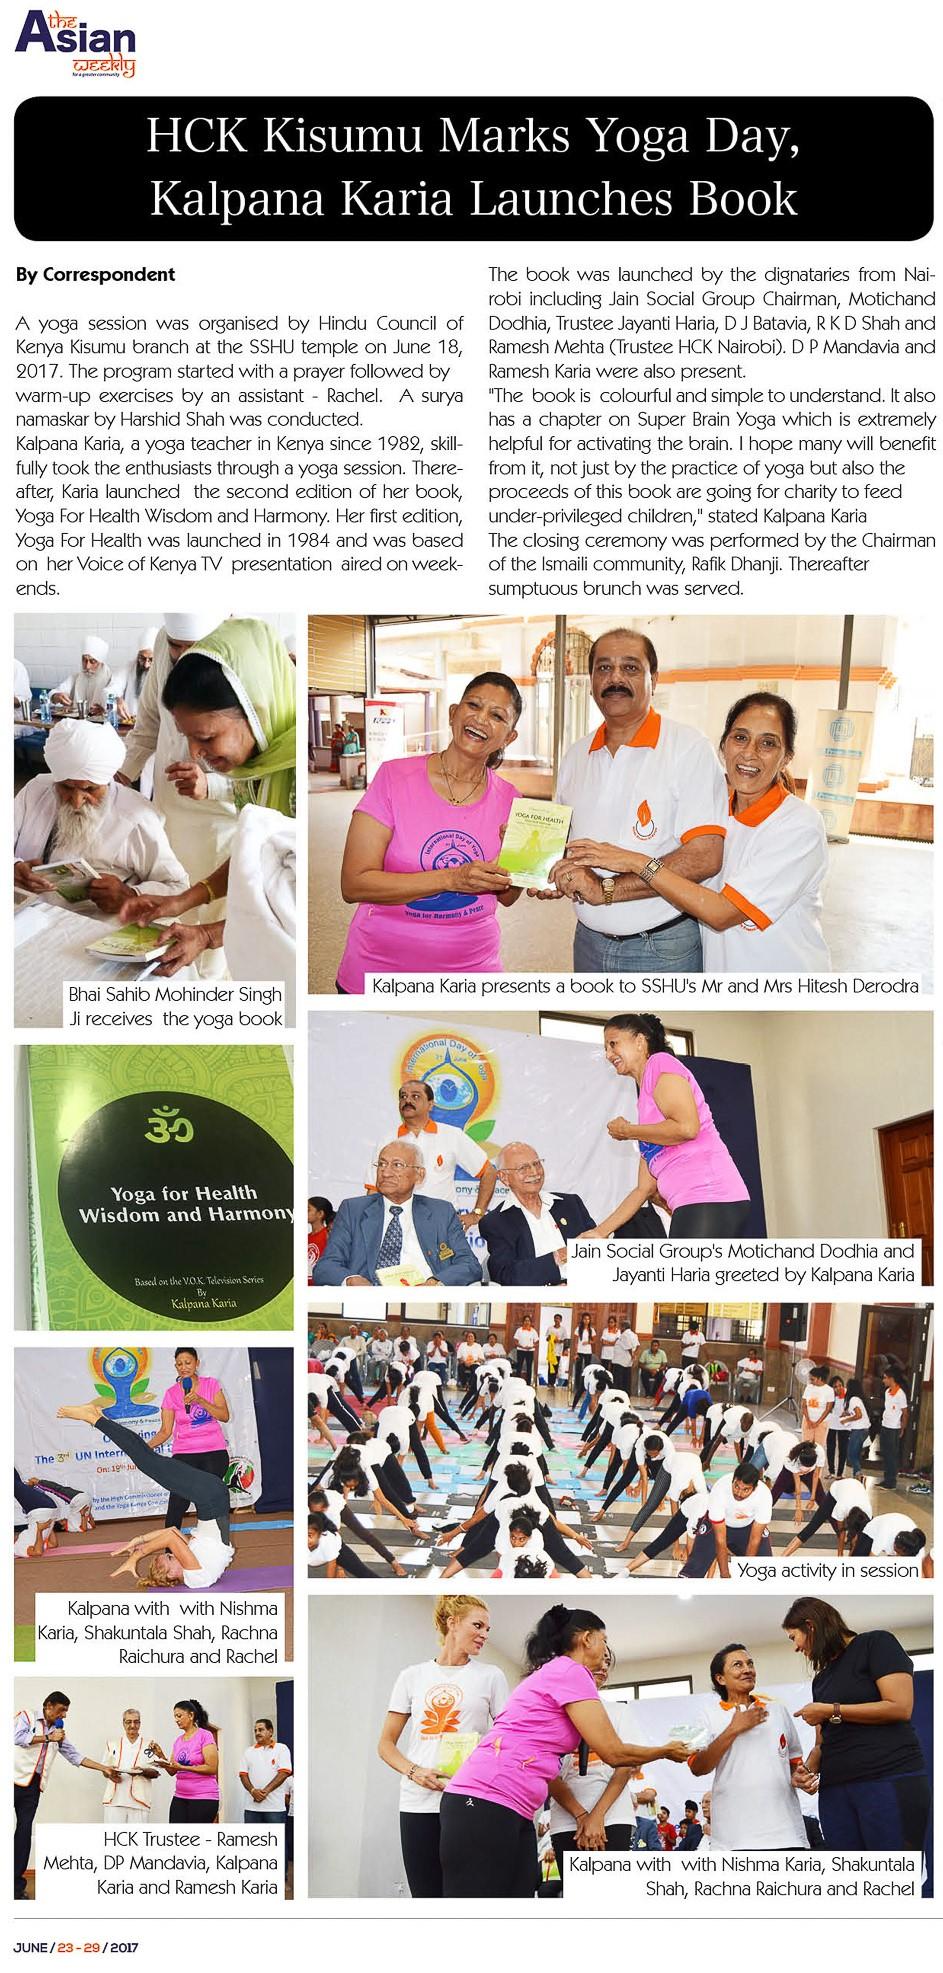 HCK Kisumu Marks Yoga Day, Kalpana Karia Launches Book By Correspondent